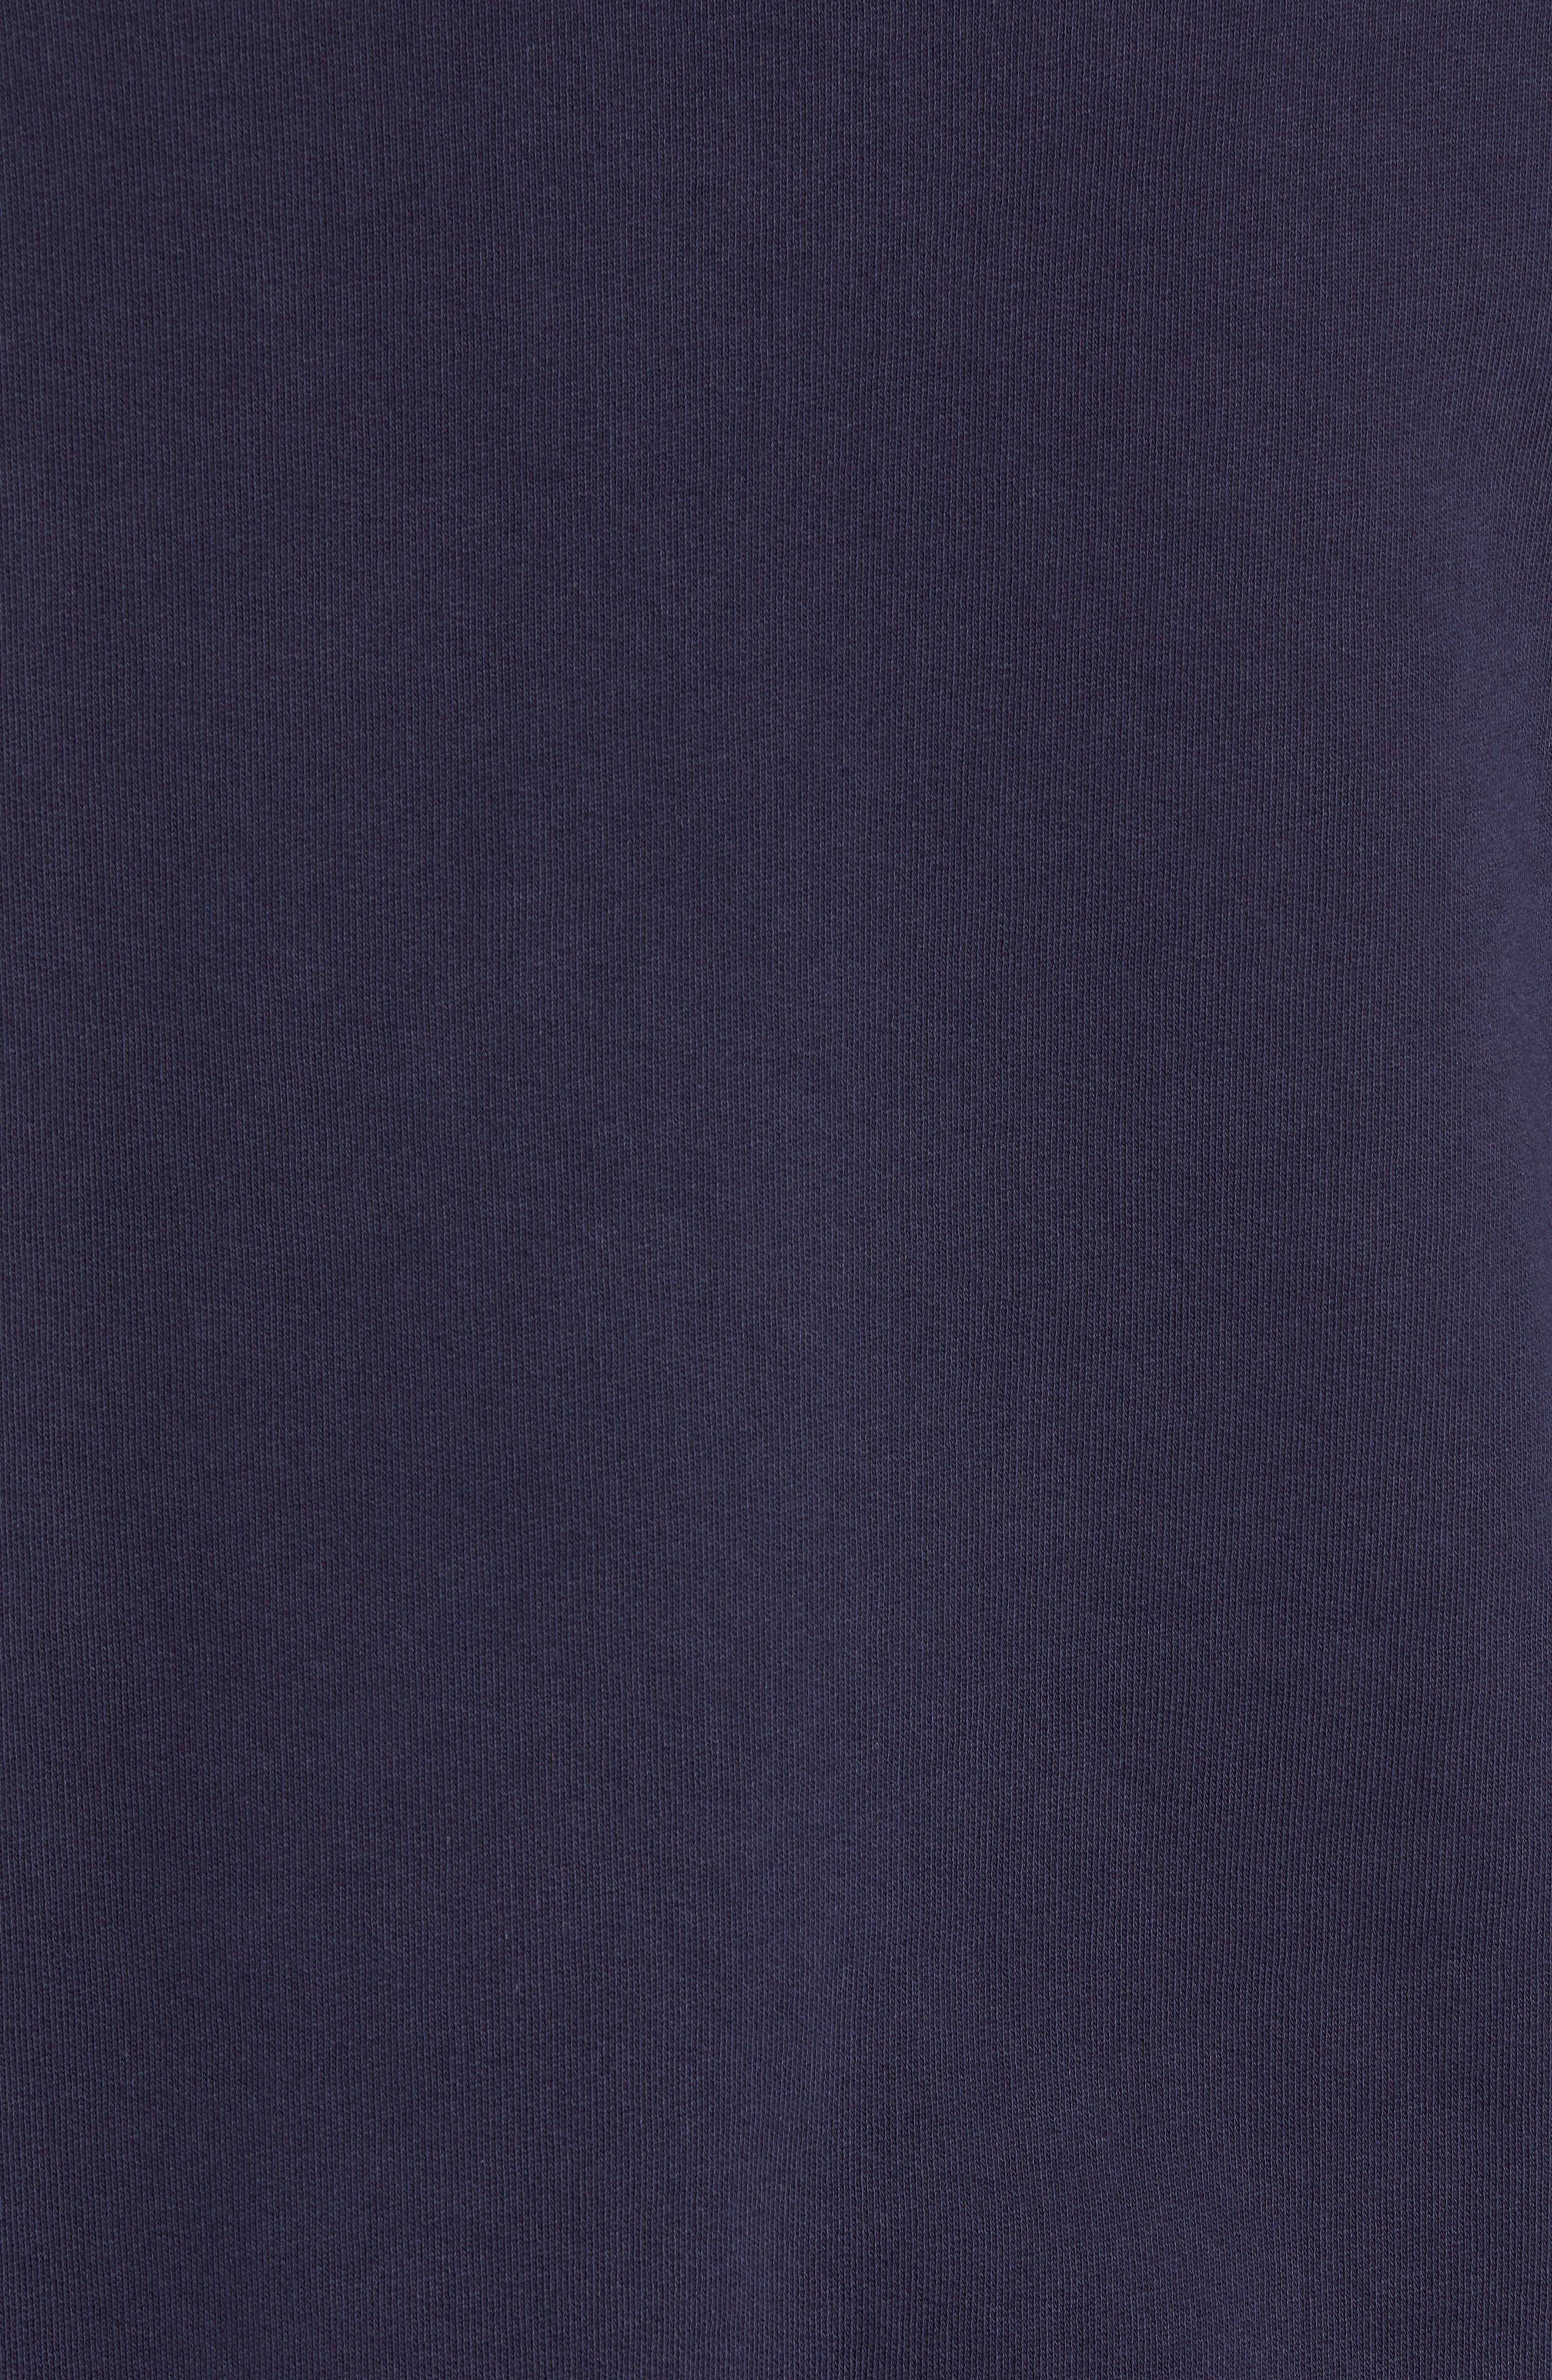 Slim Fit Lion Embroidered Sweatshirt,                             Alternate thumbnail 5, color,                             NAVY BLAZER